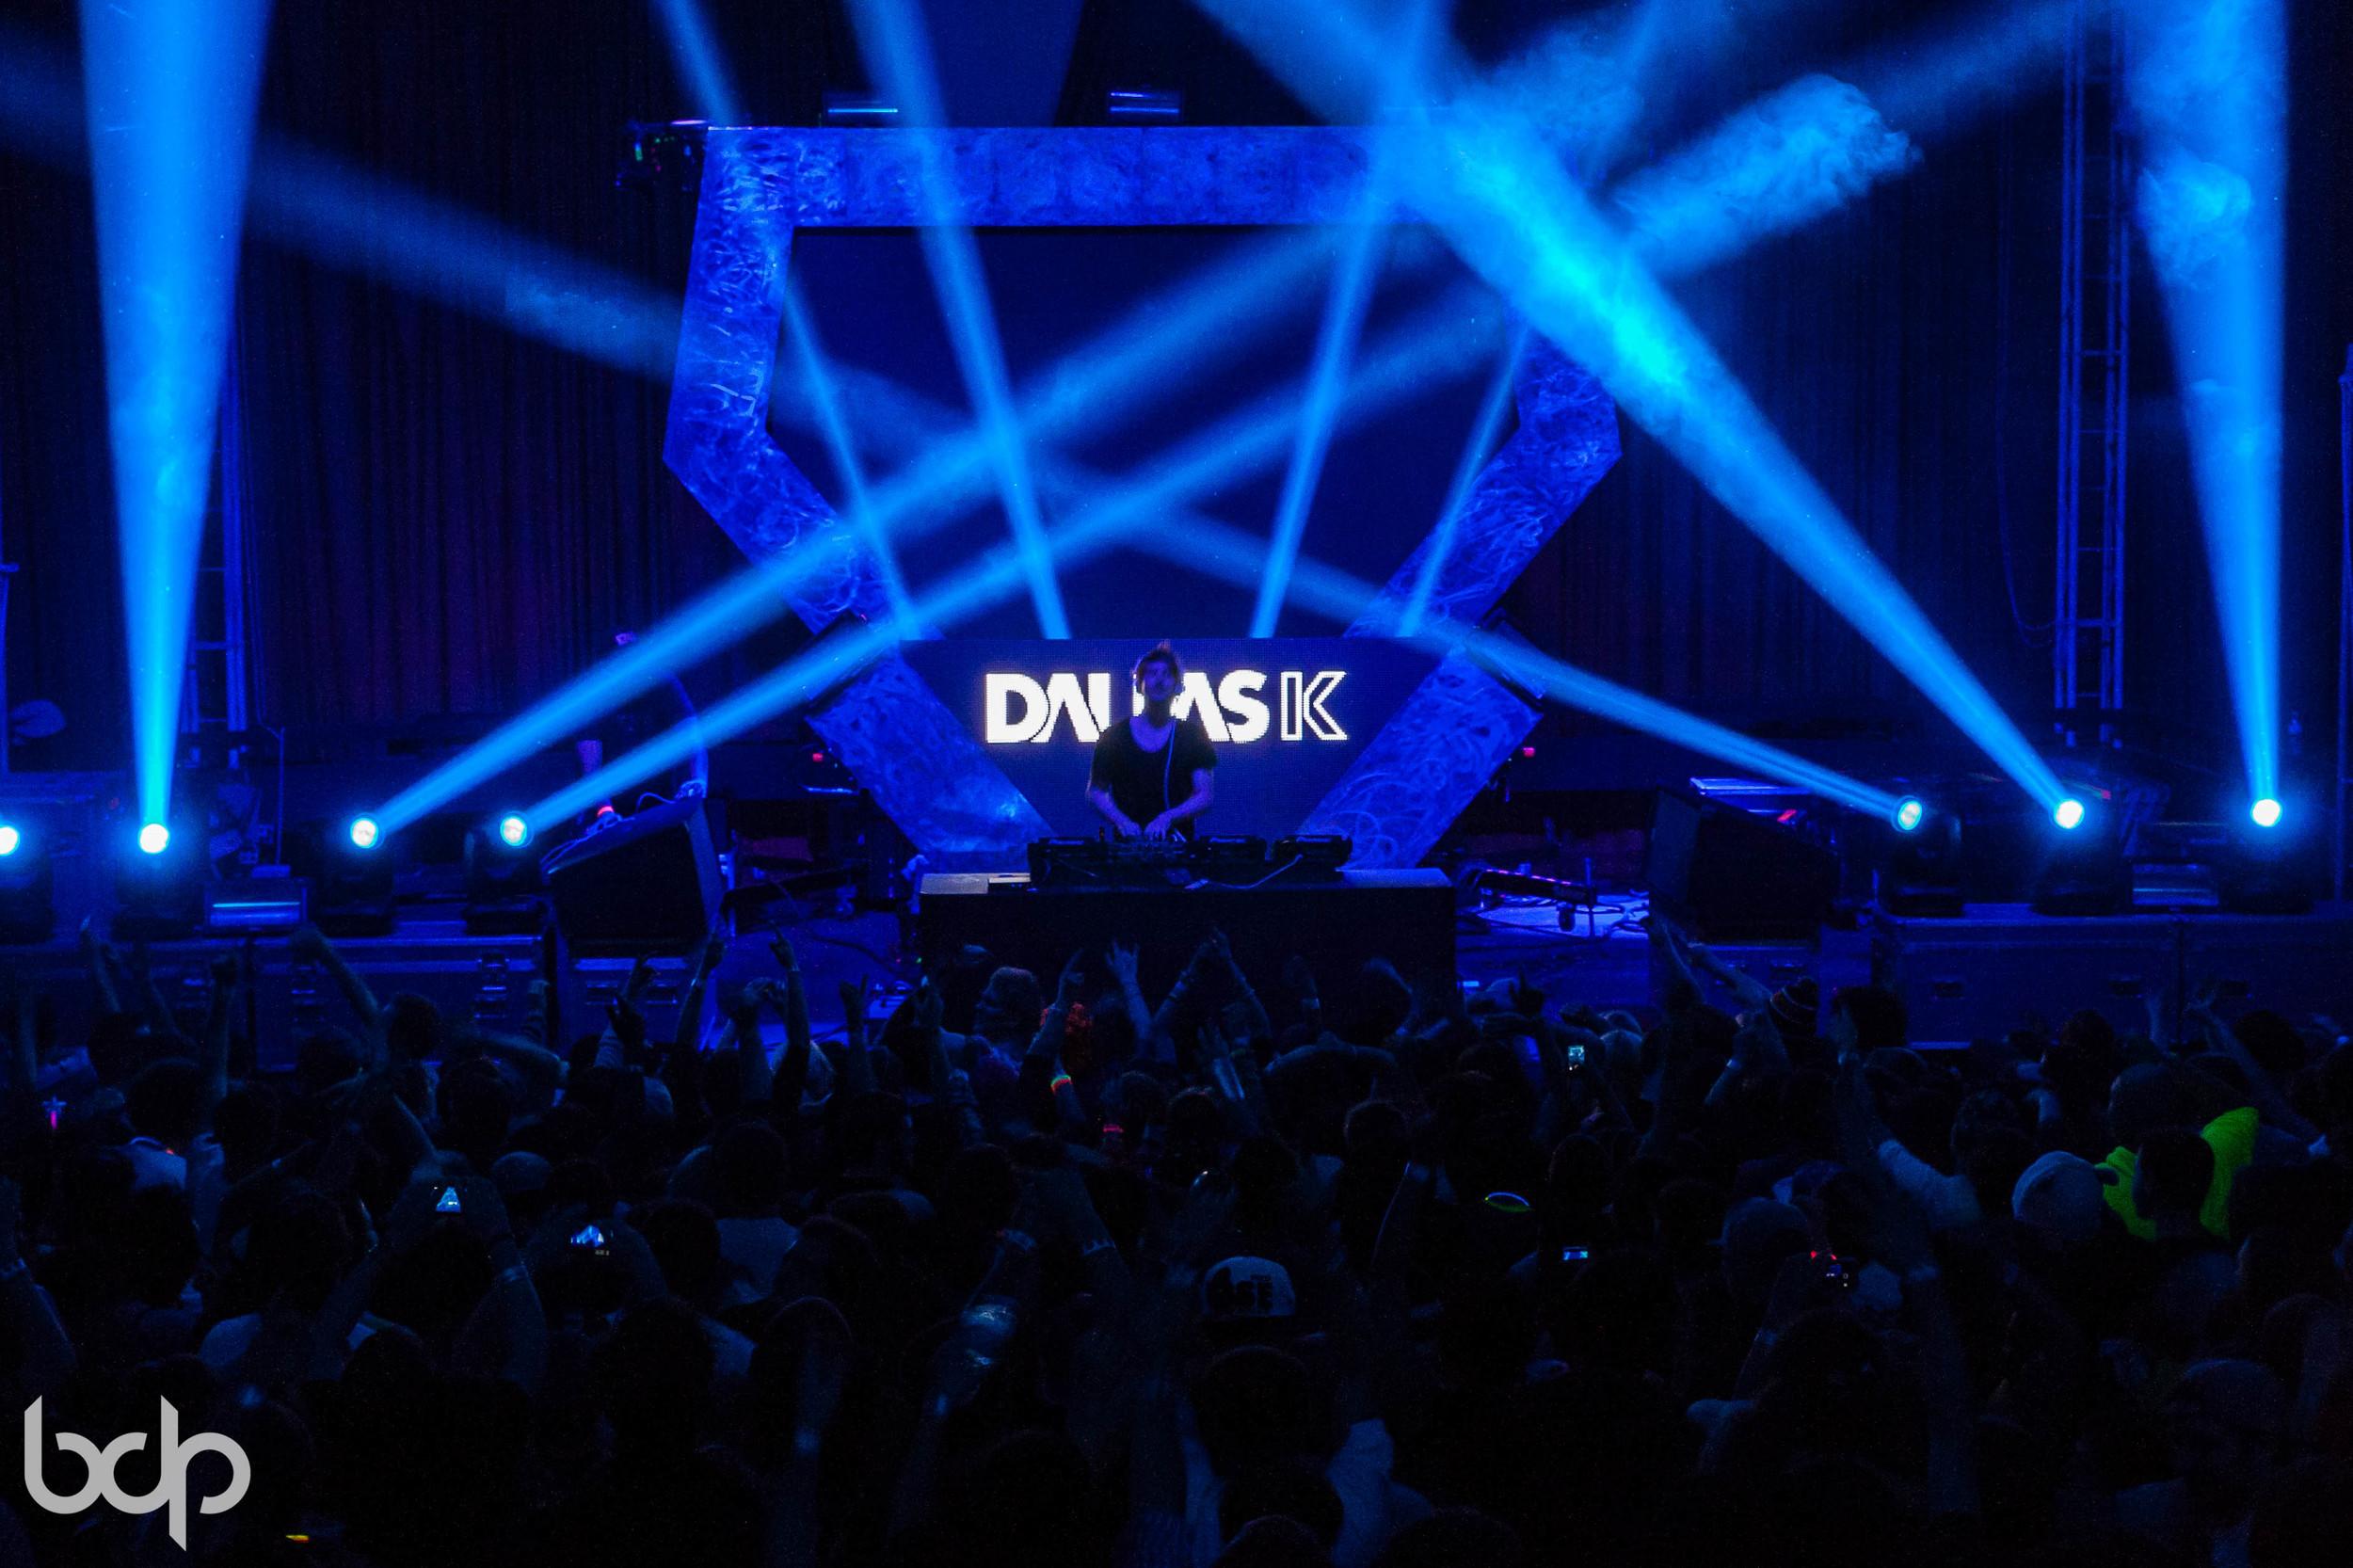 DallasK, DVBBS & Adventure Club at Skyway Theatre 121113 BDP-16.jpg